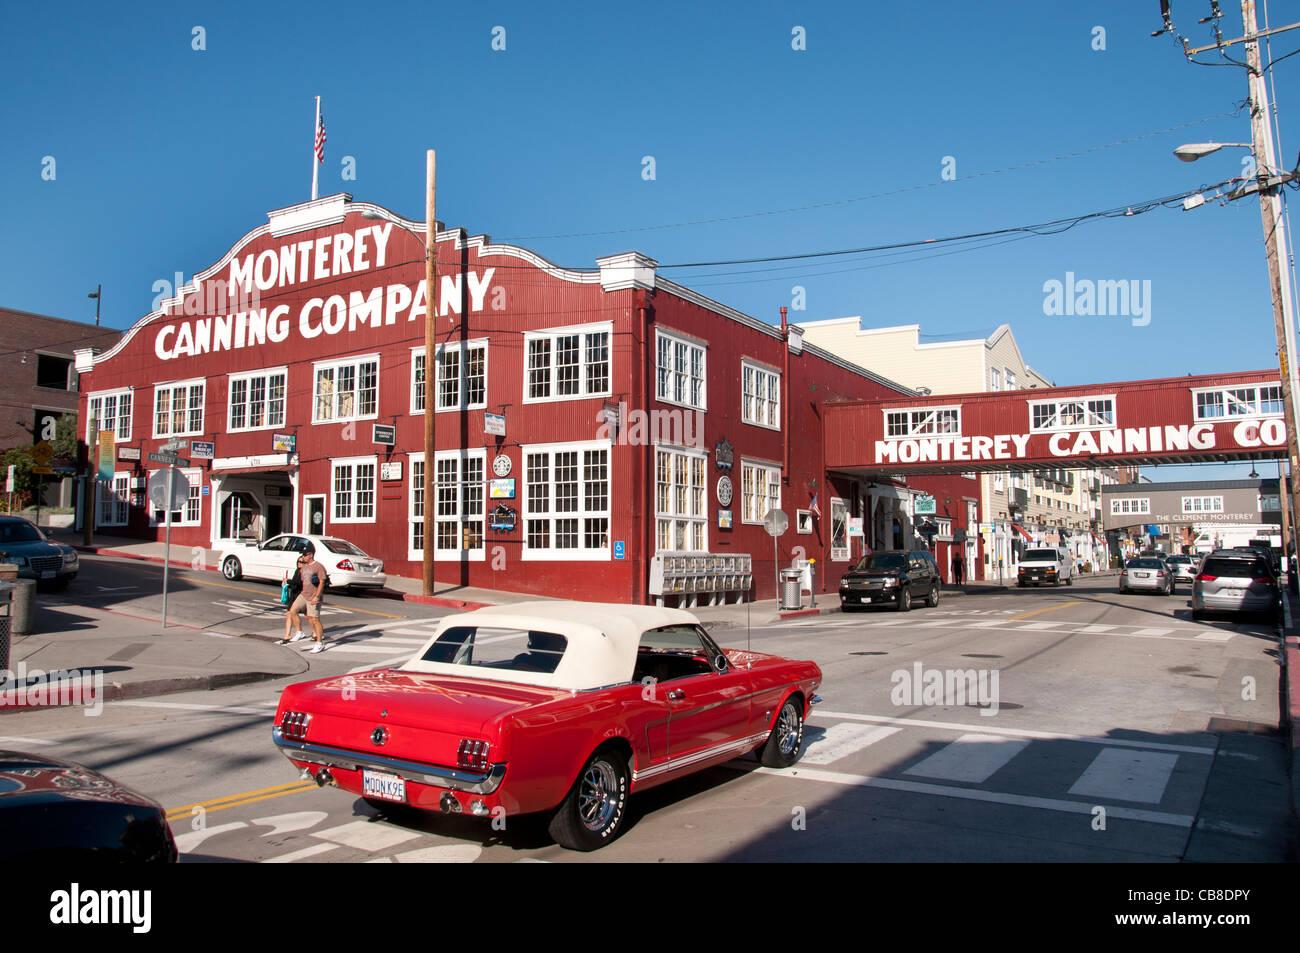 Monterey Canning Company California Port Harbor USA American United States of America - Stock Image